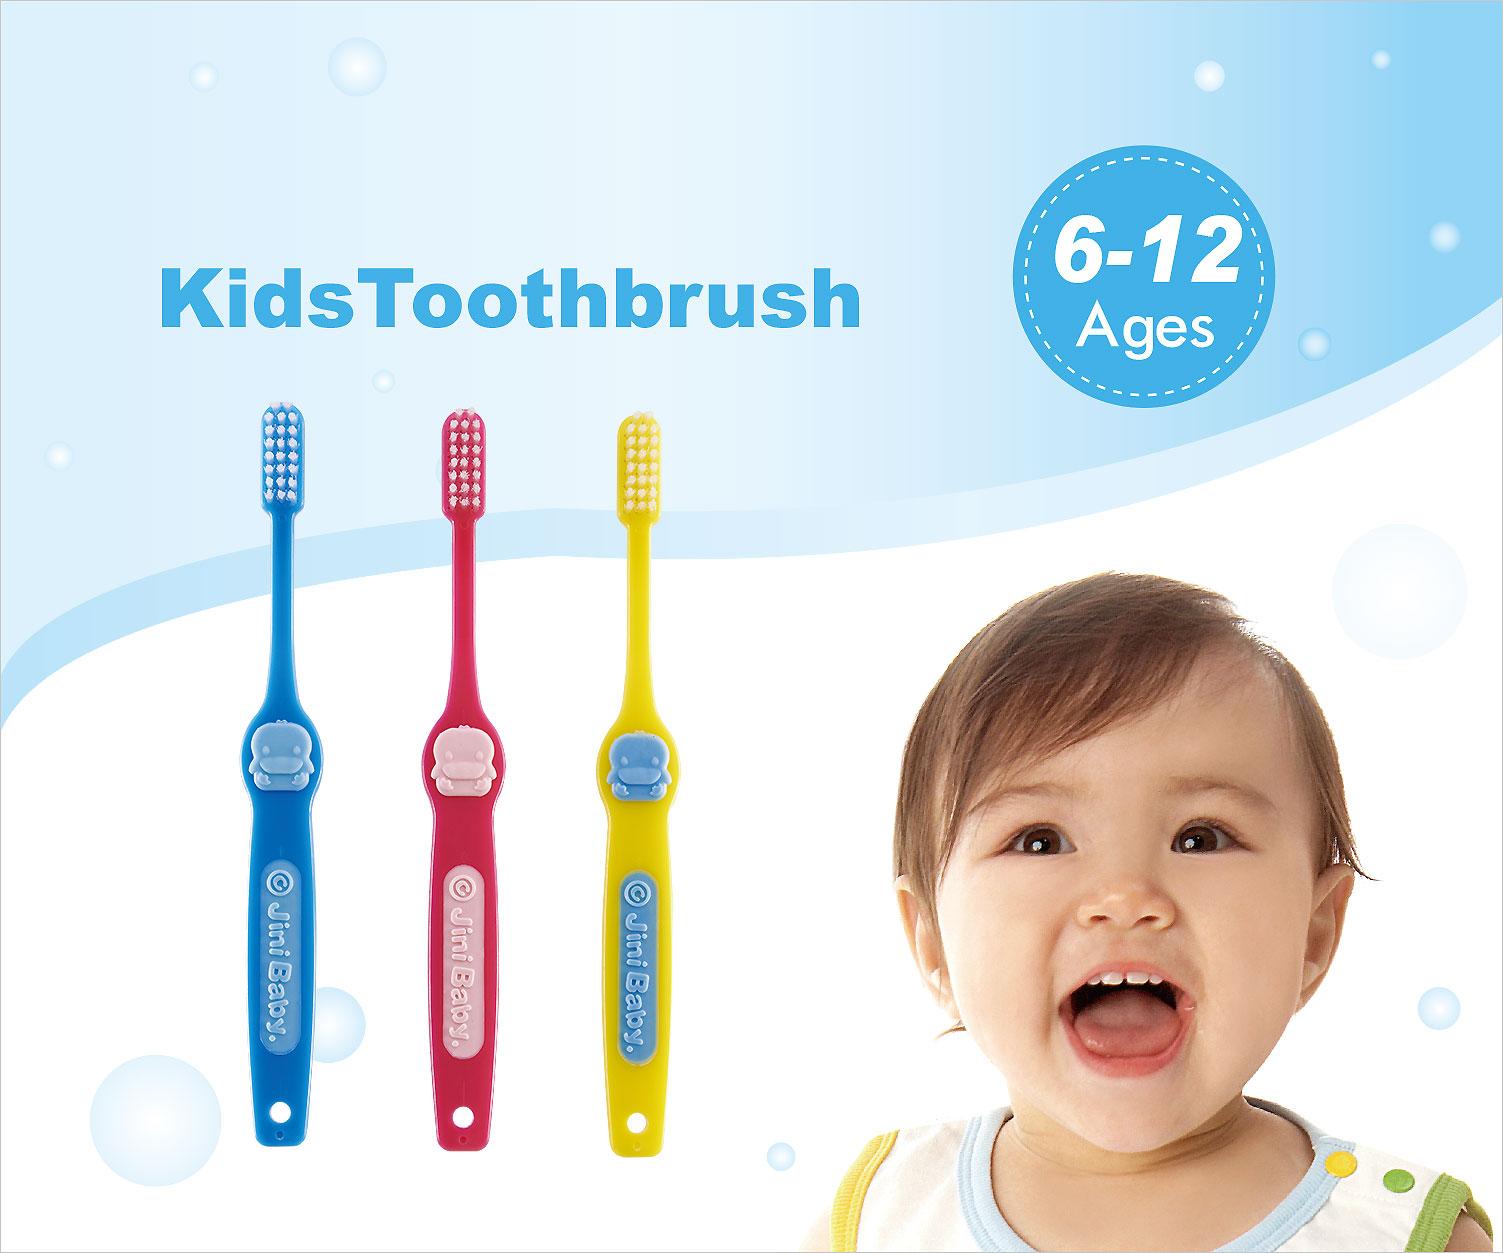 proimages/Bathing&CleanSeries/Clean&Care/Toothbrush/5412/KU5412-造型幼兒牙刷網頁編輯-E1.jpg